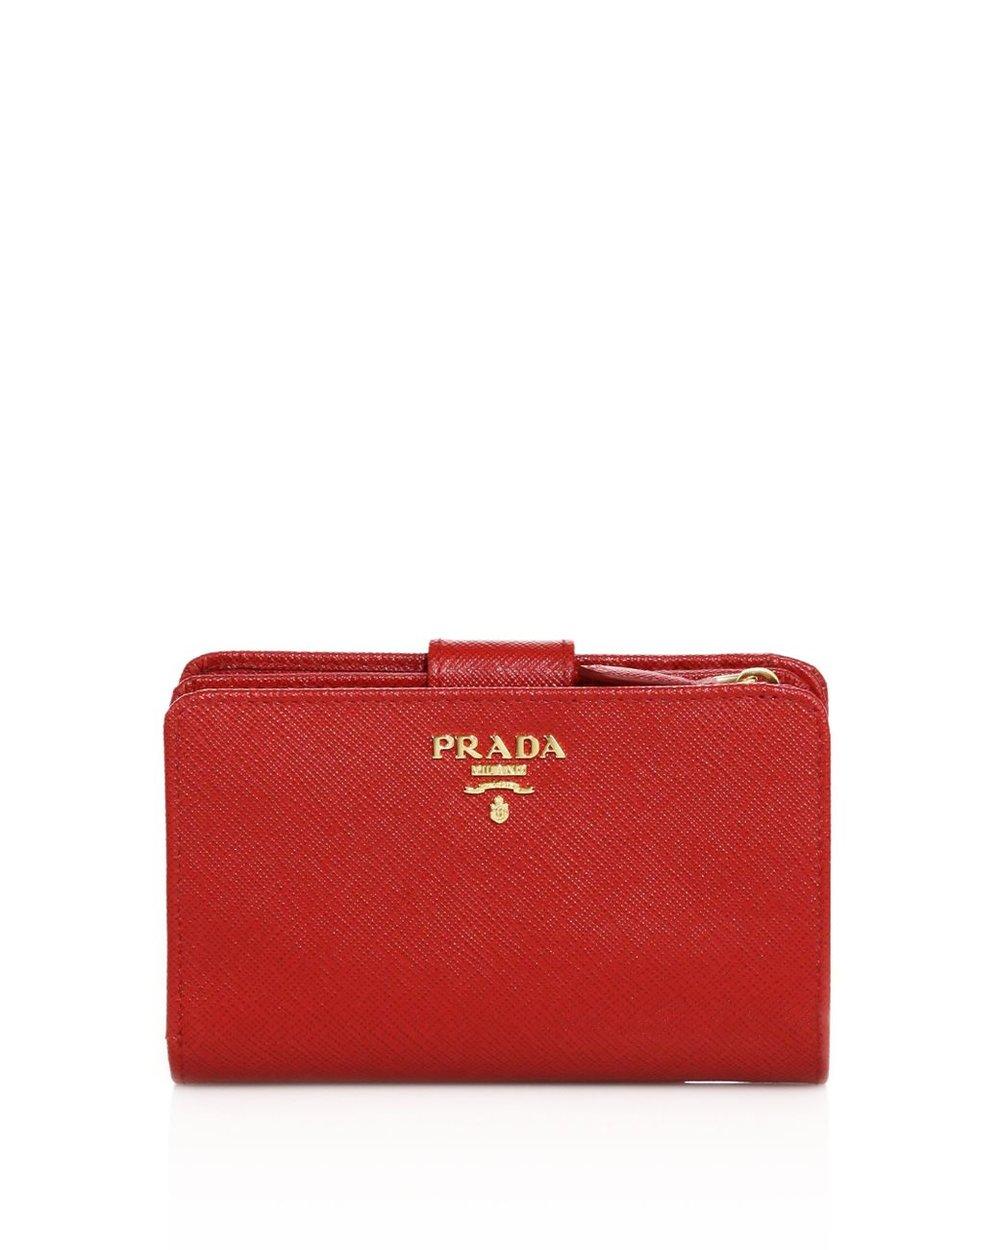 prada-fuoco-saffiano-leather-wallet-product-0-828475683-normal.jpeg